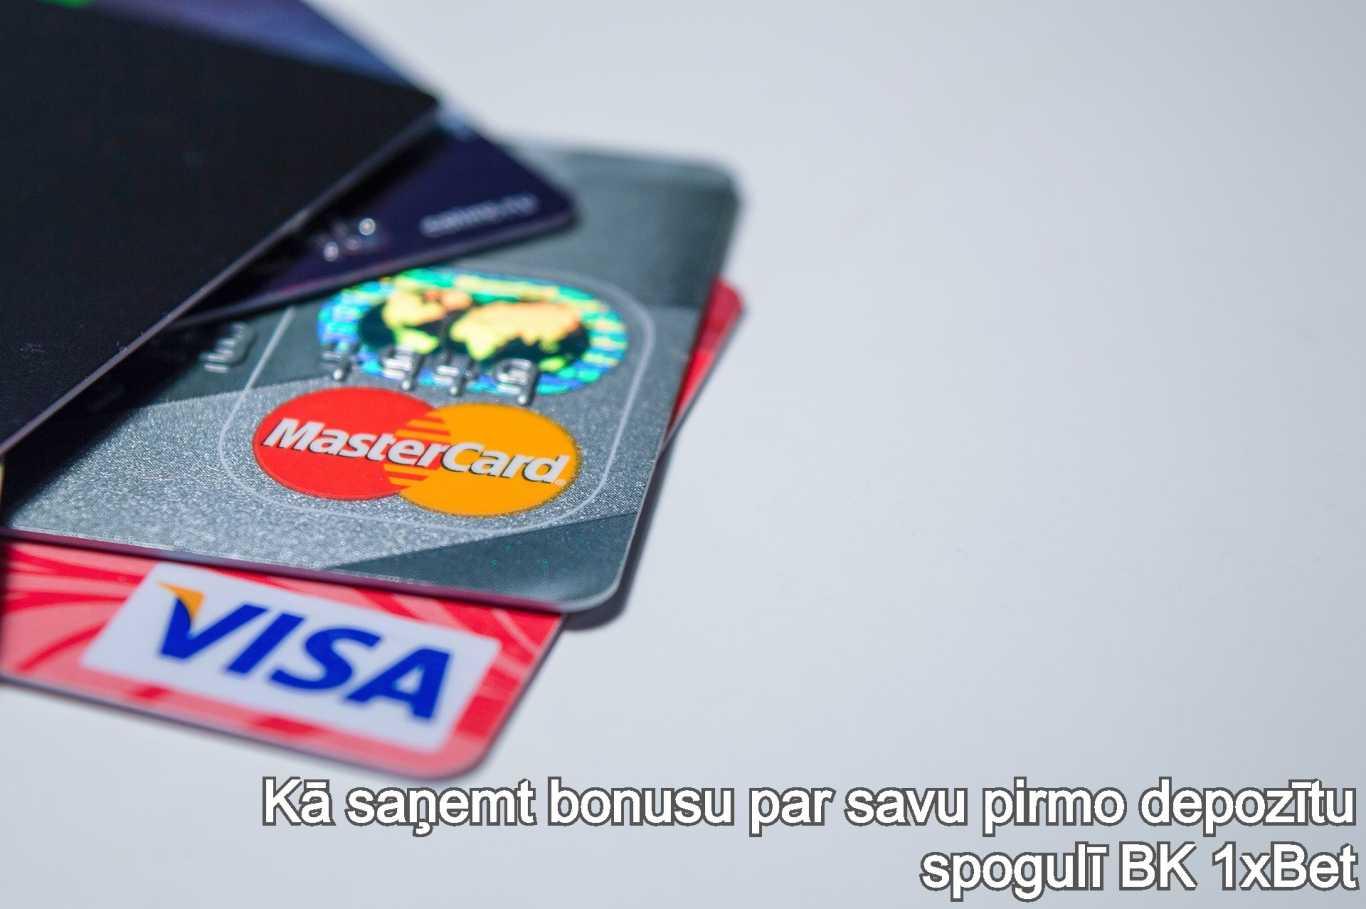 spogulī 1xBet payments